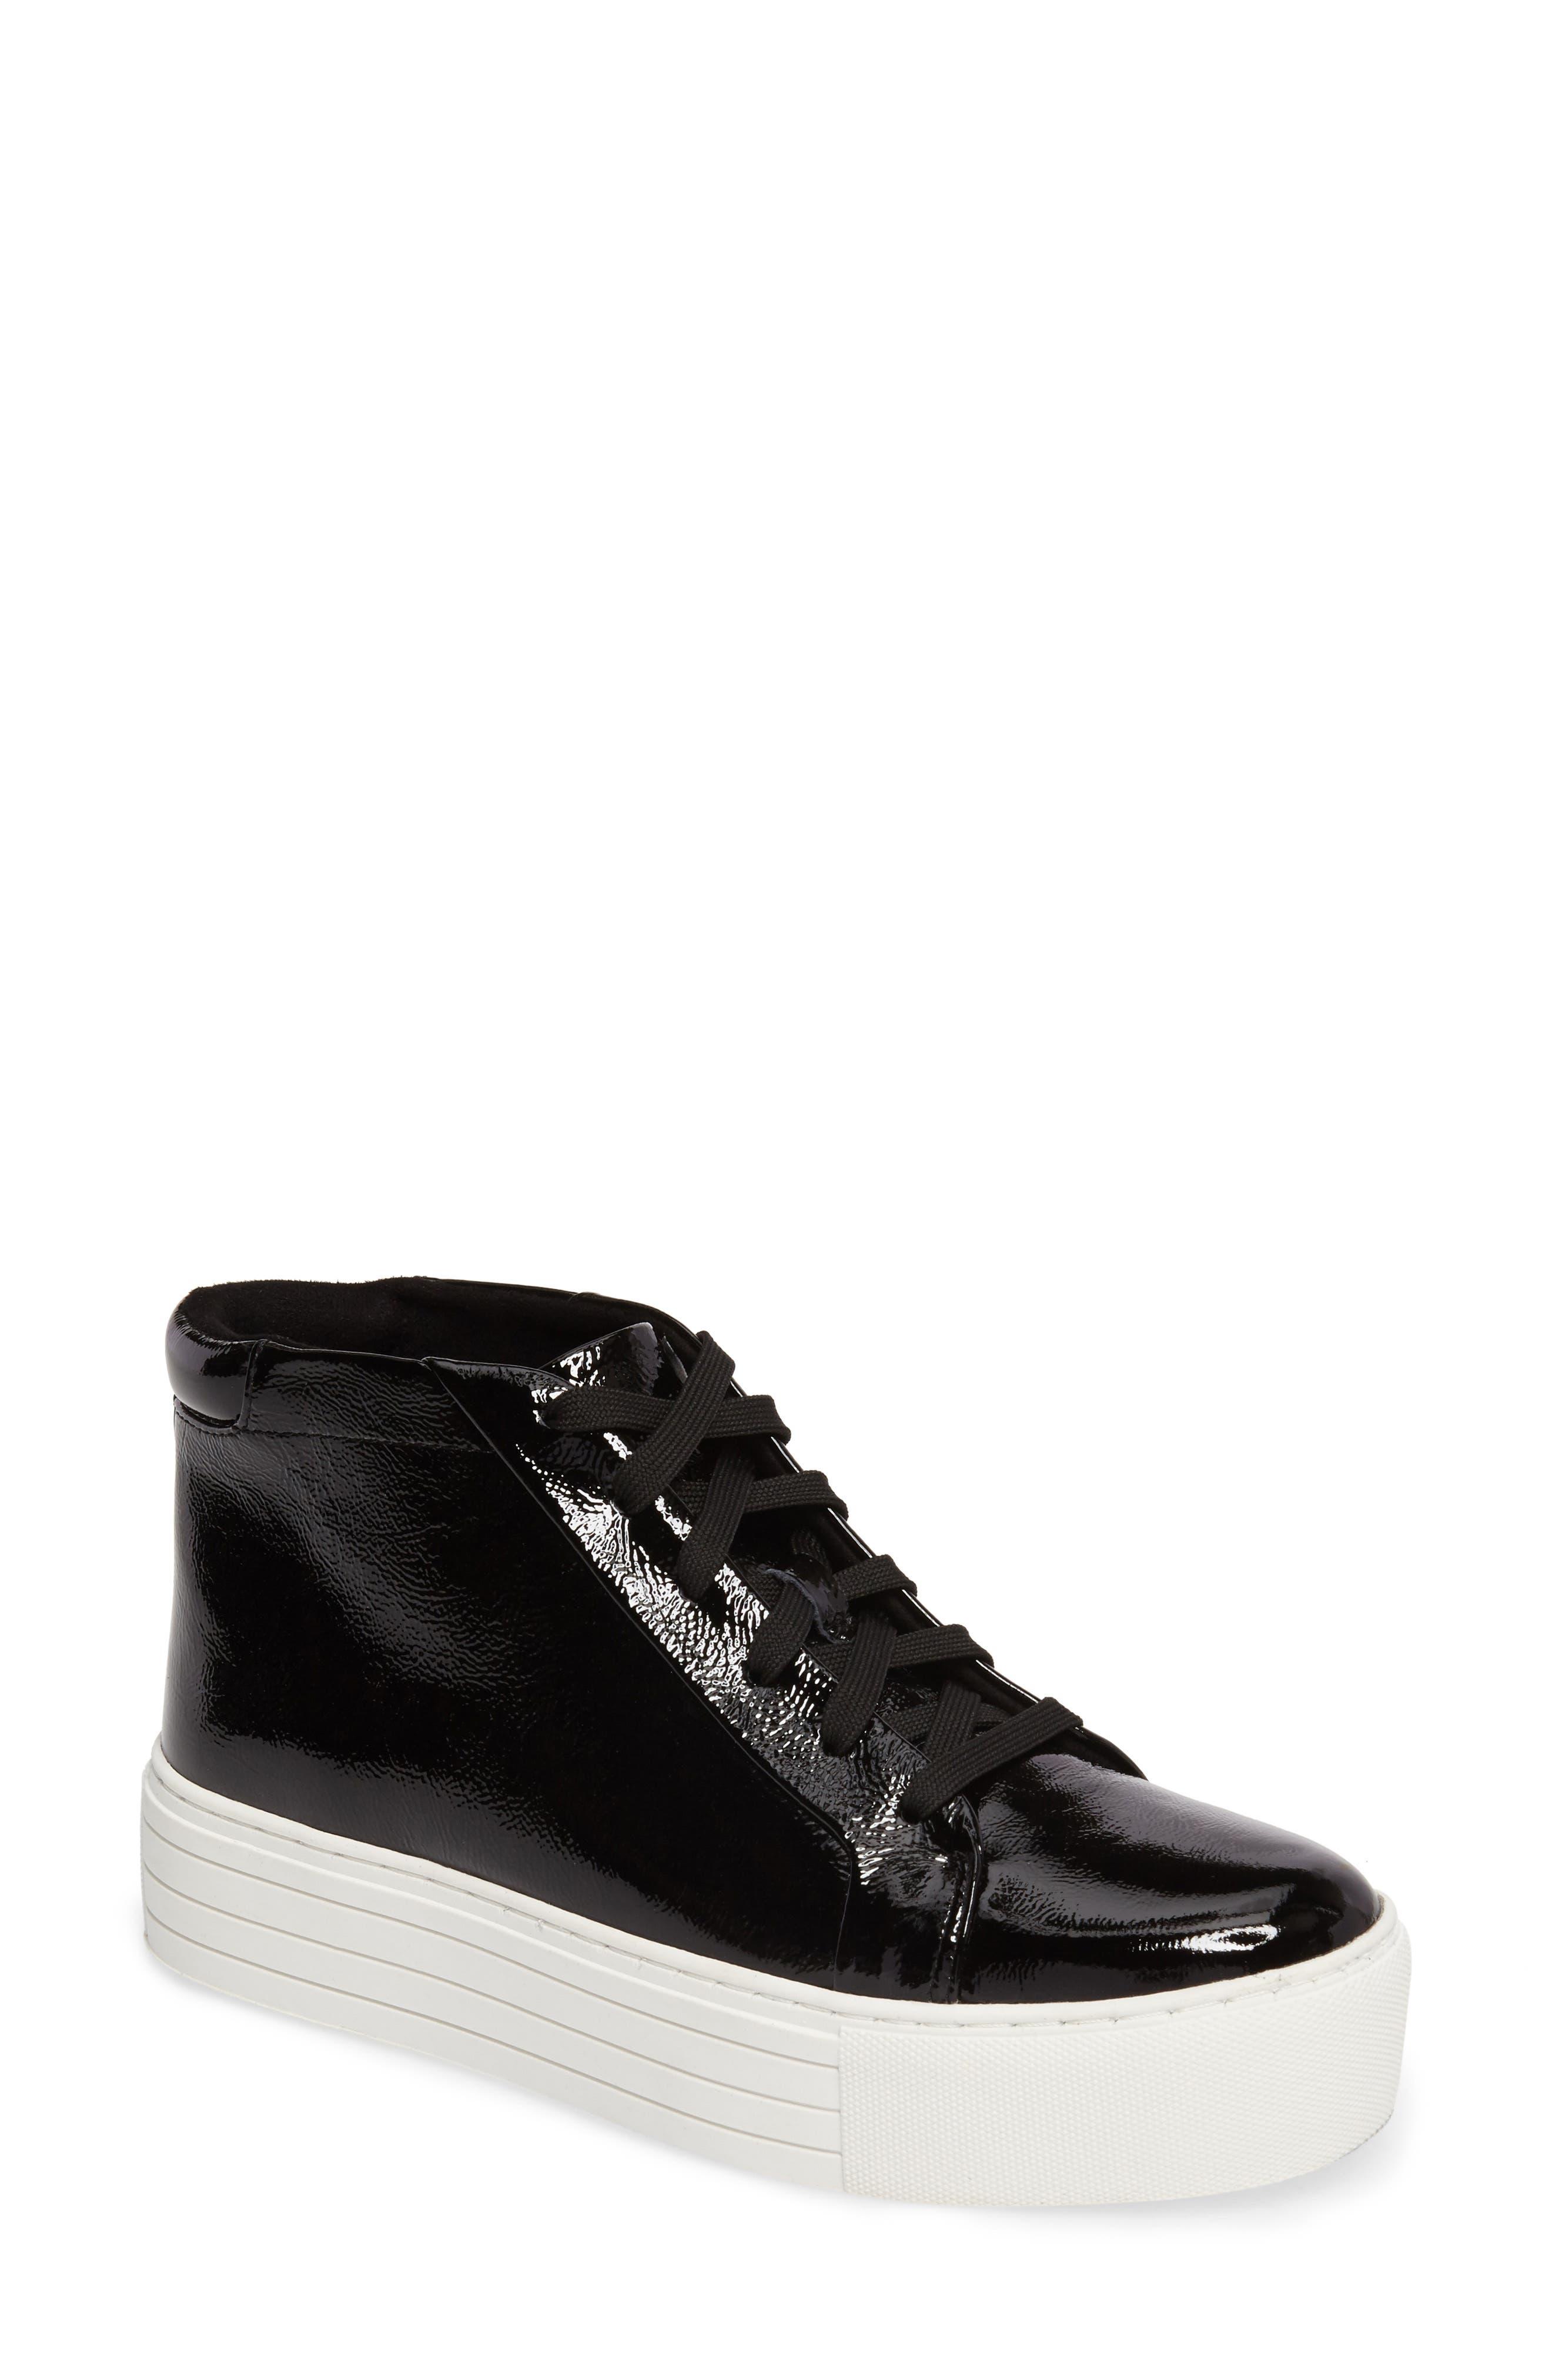 Janette High Top Platform Sneaker,                             Main thumbnail 1, color,                             BLACK PATENT LEATHER